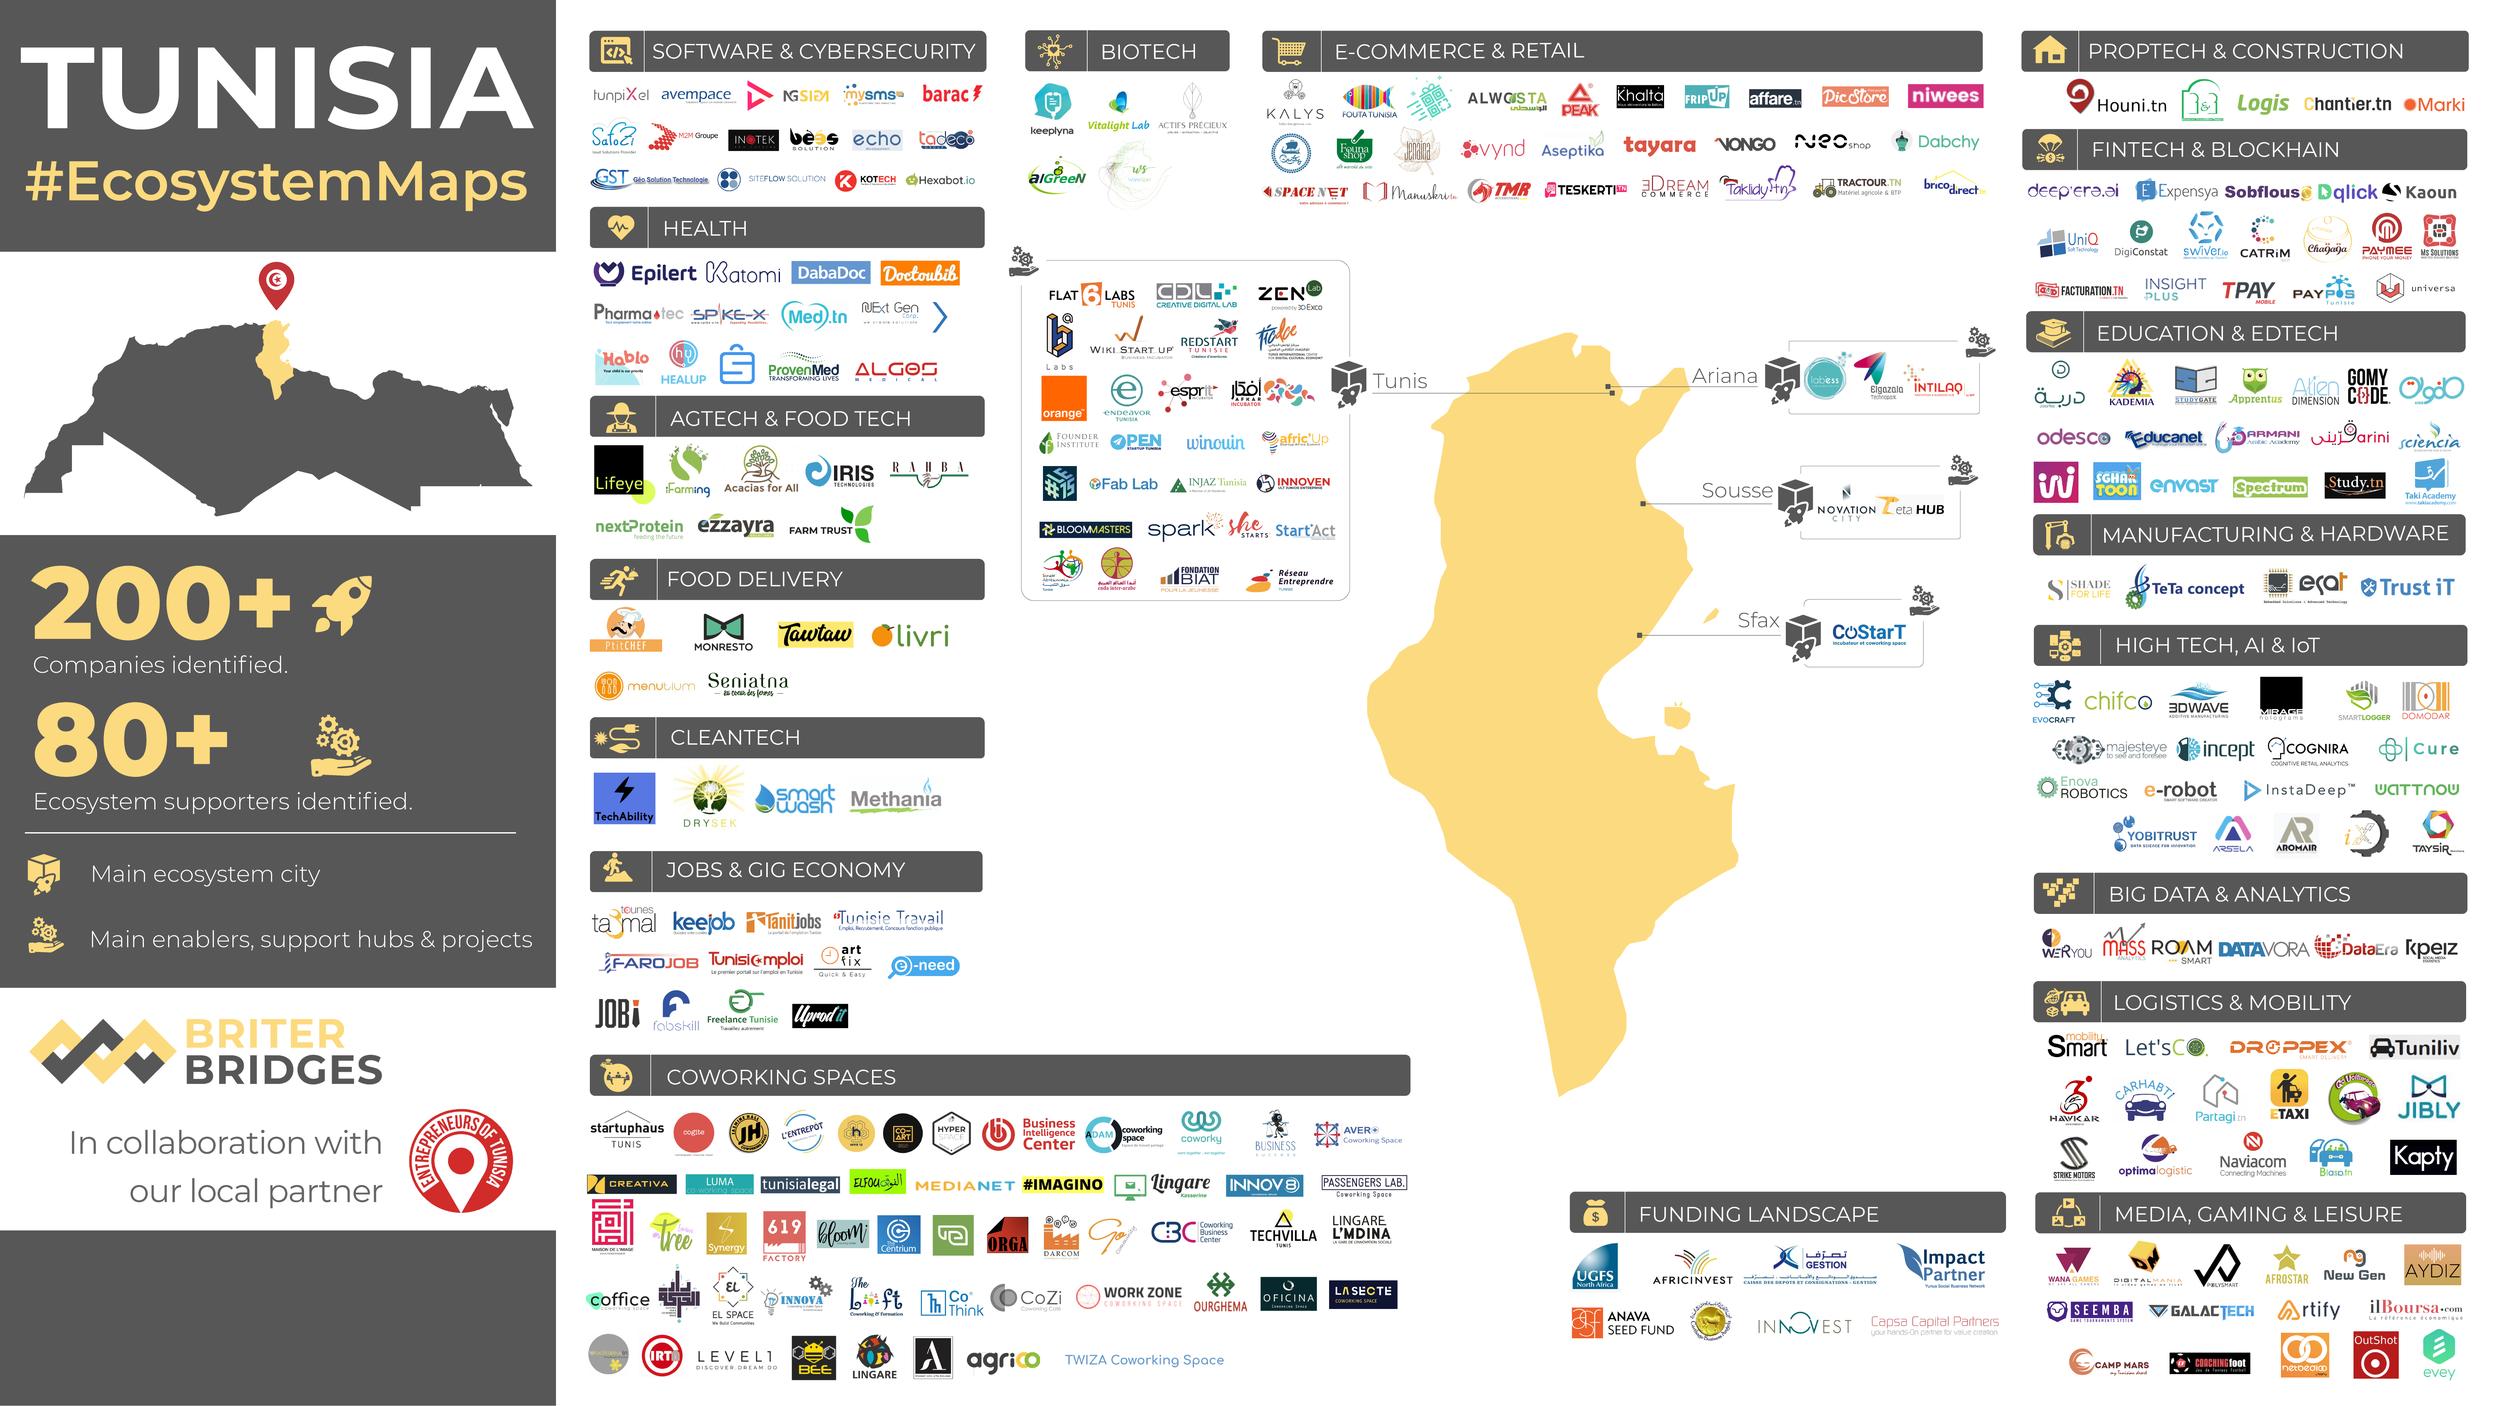 Tunisia's Tech Ecosystem Map - Q3 2019